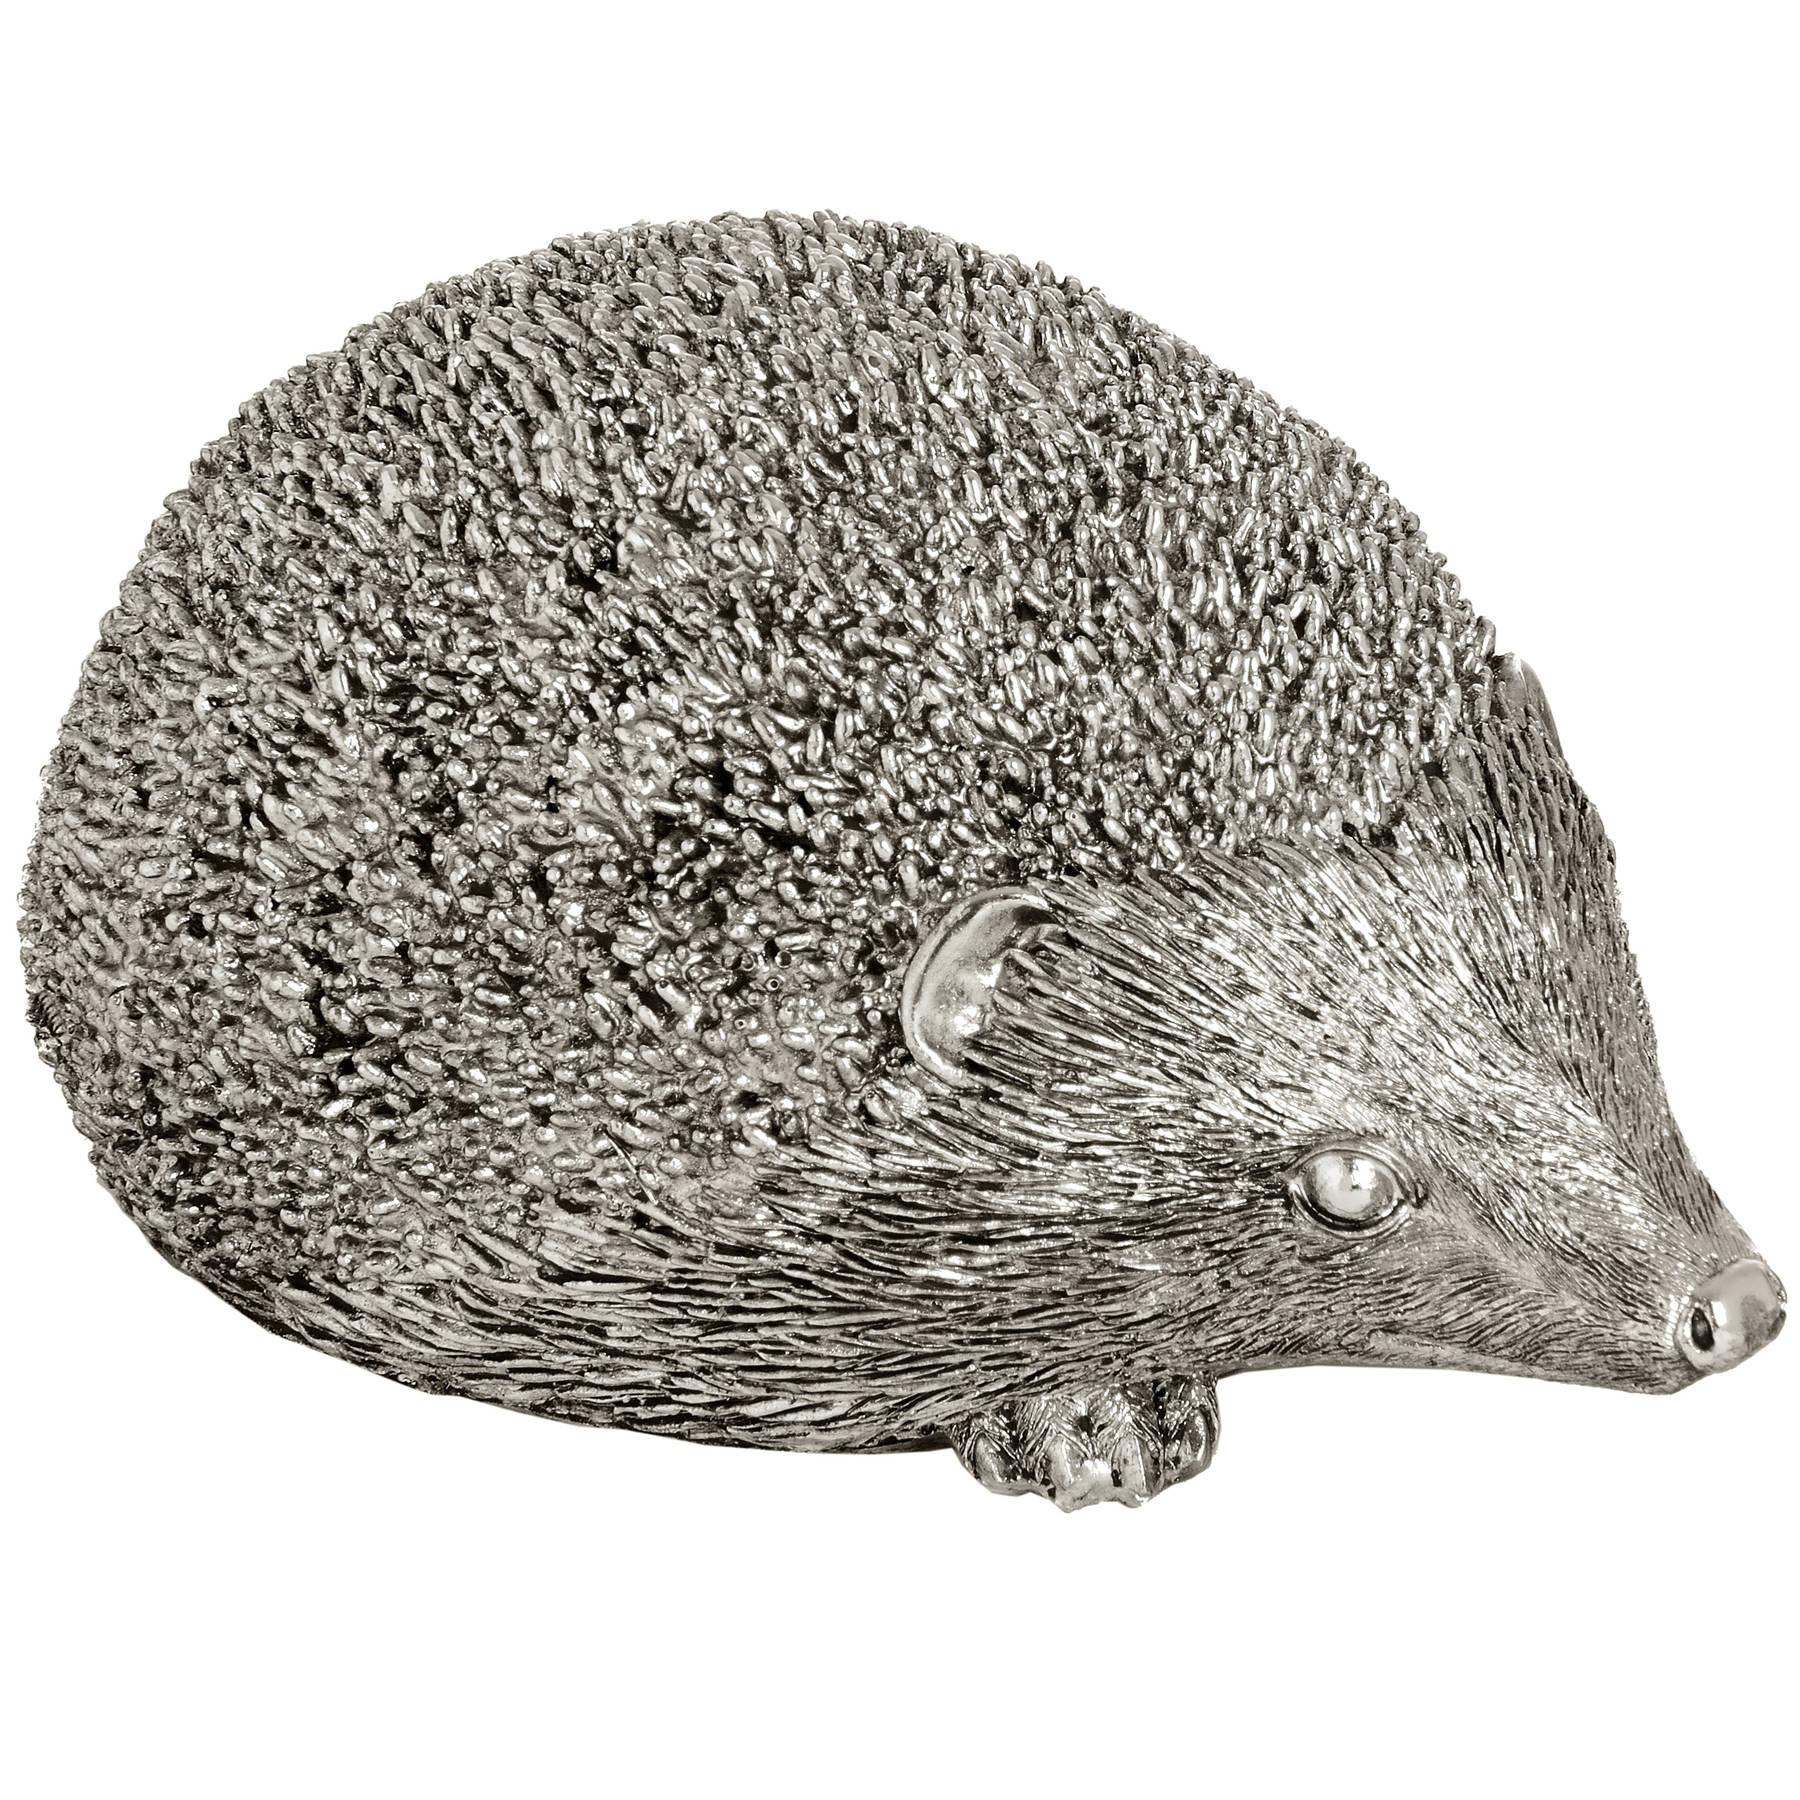 Henry The Silver Hedgehog - Image 1